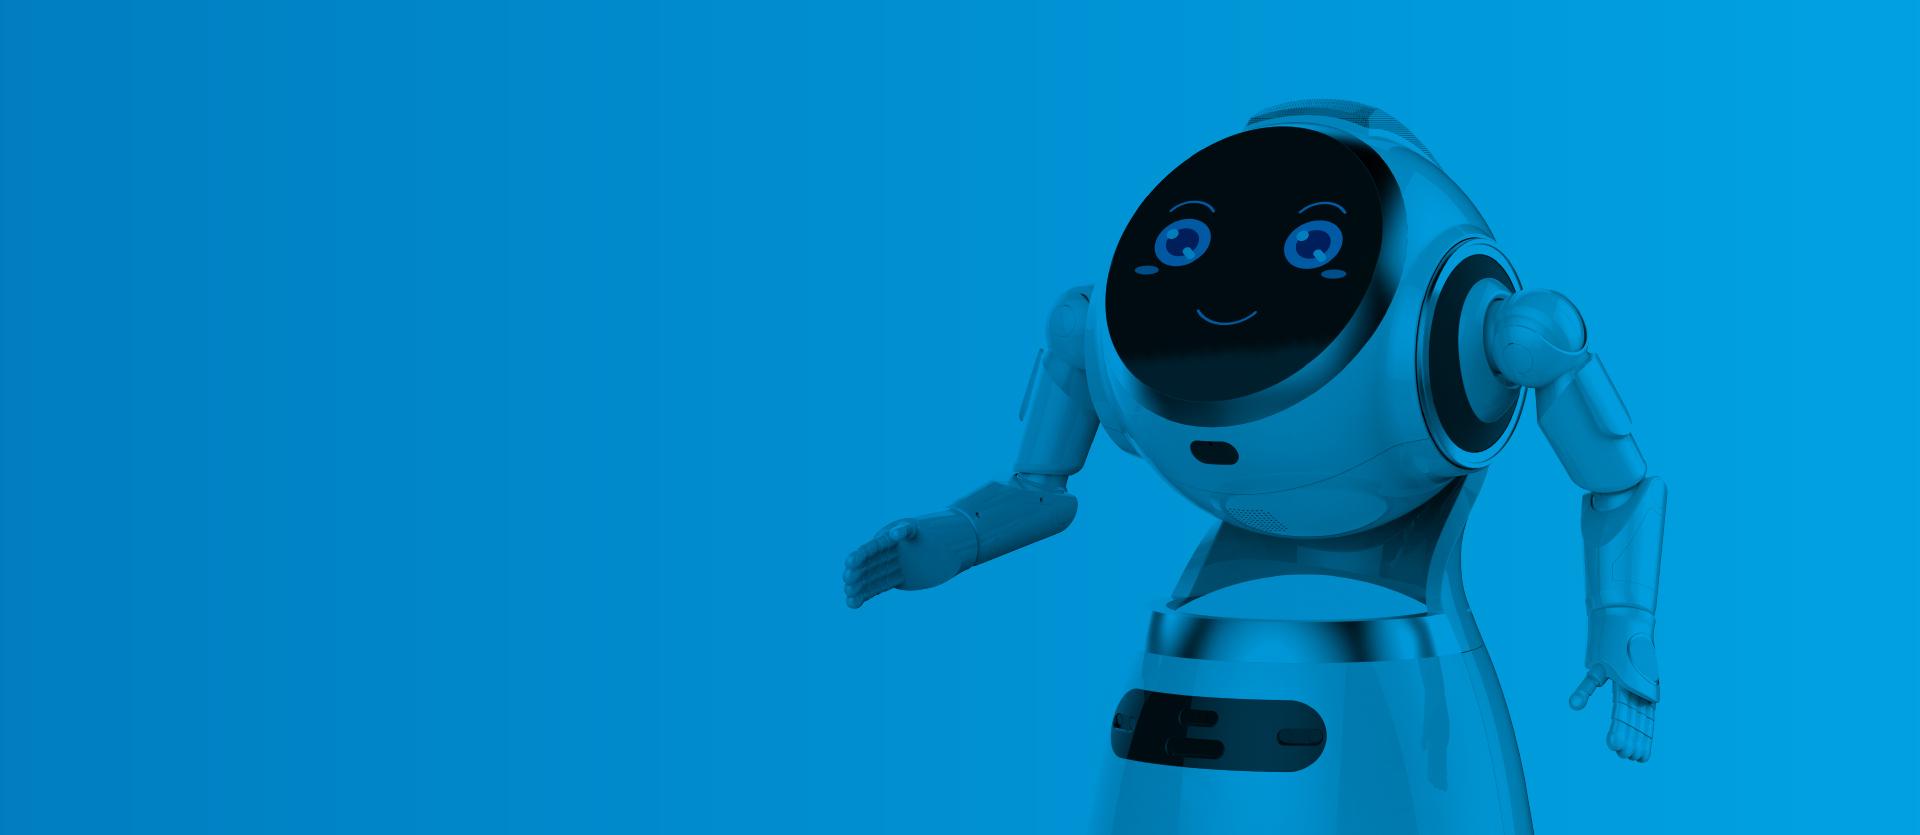 Ecco a voi il robot Aphel